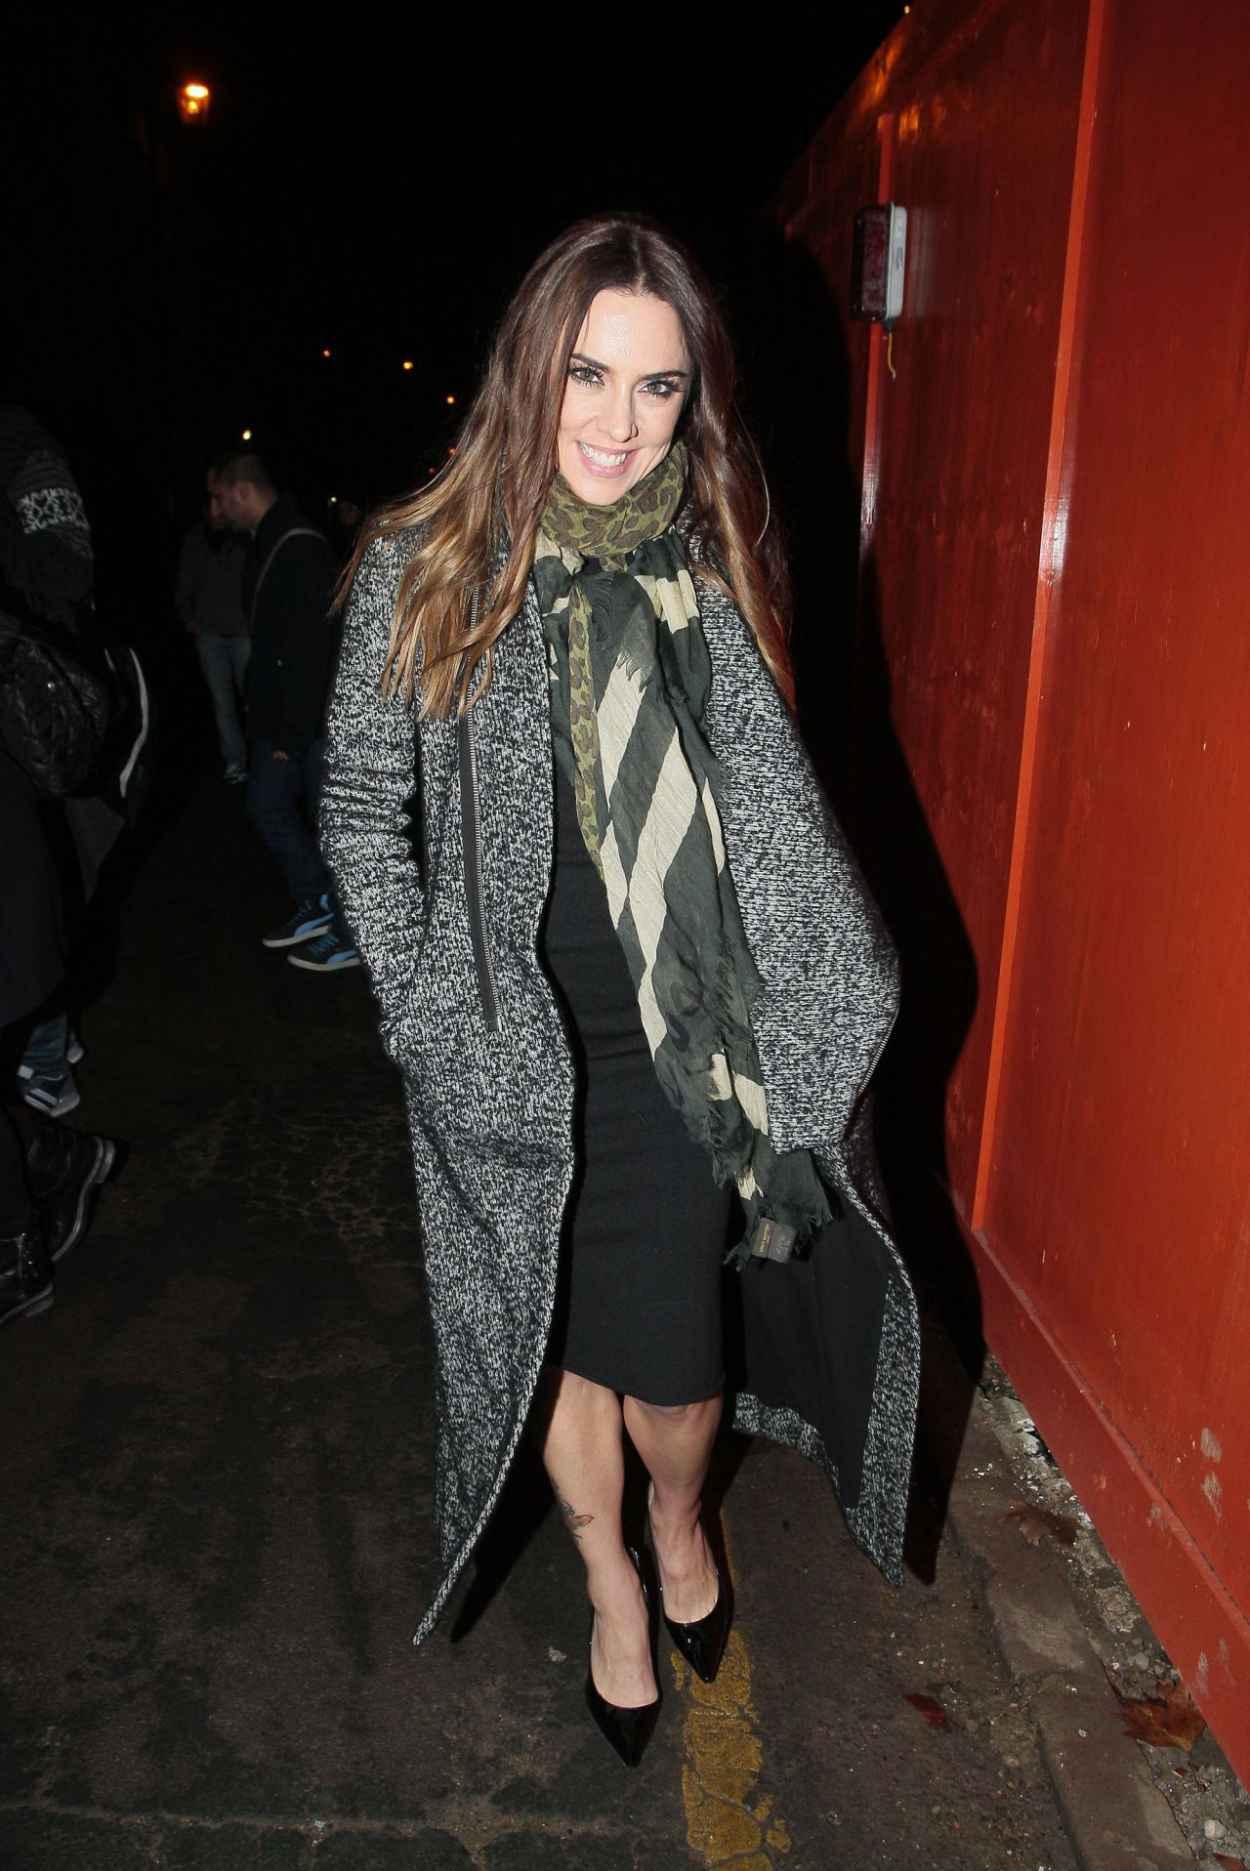 Melanie Chisholm Street Style - Leaving the Union Chapel in London - December 2015-5